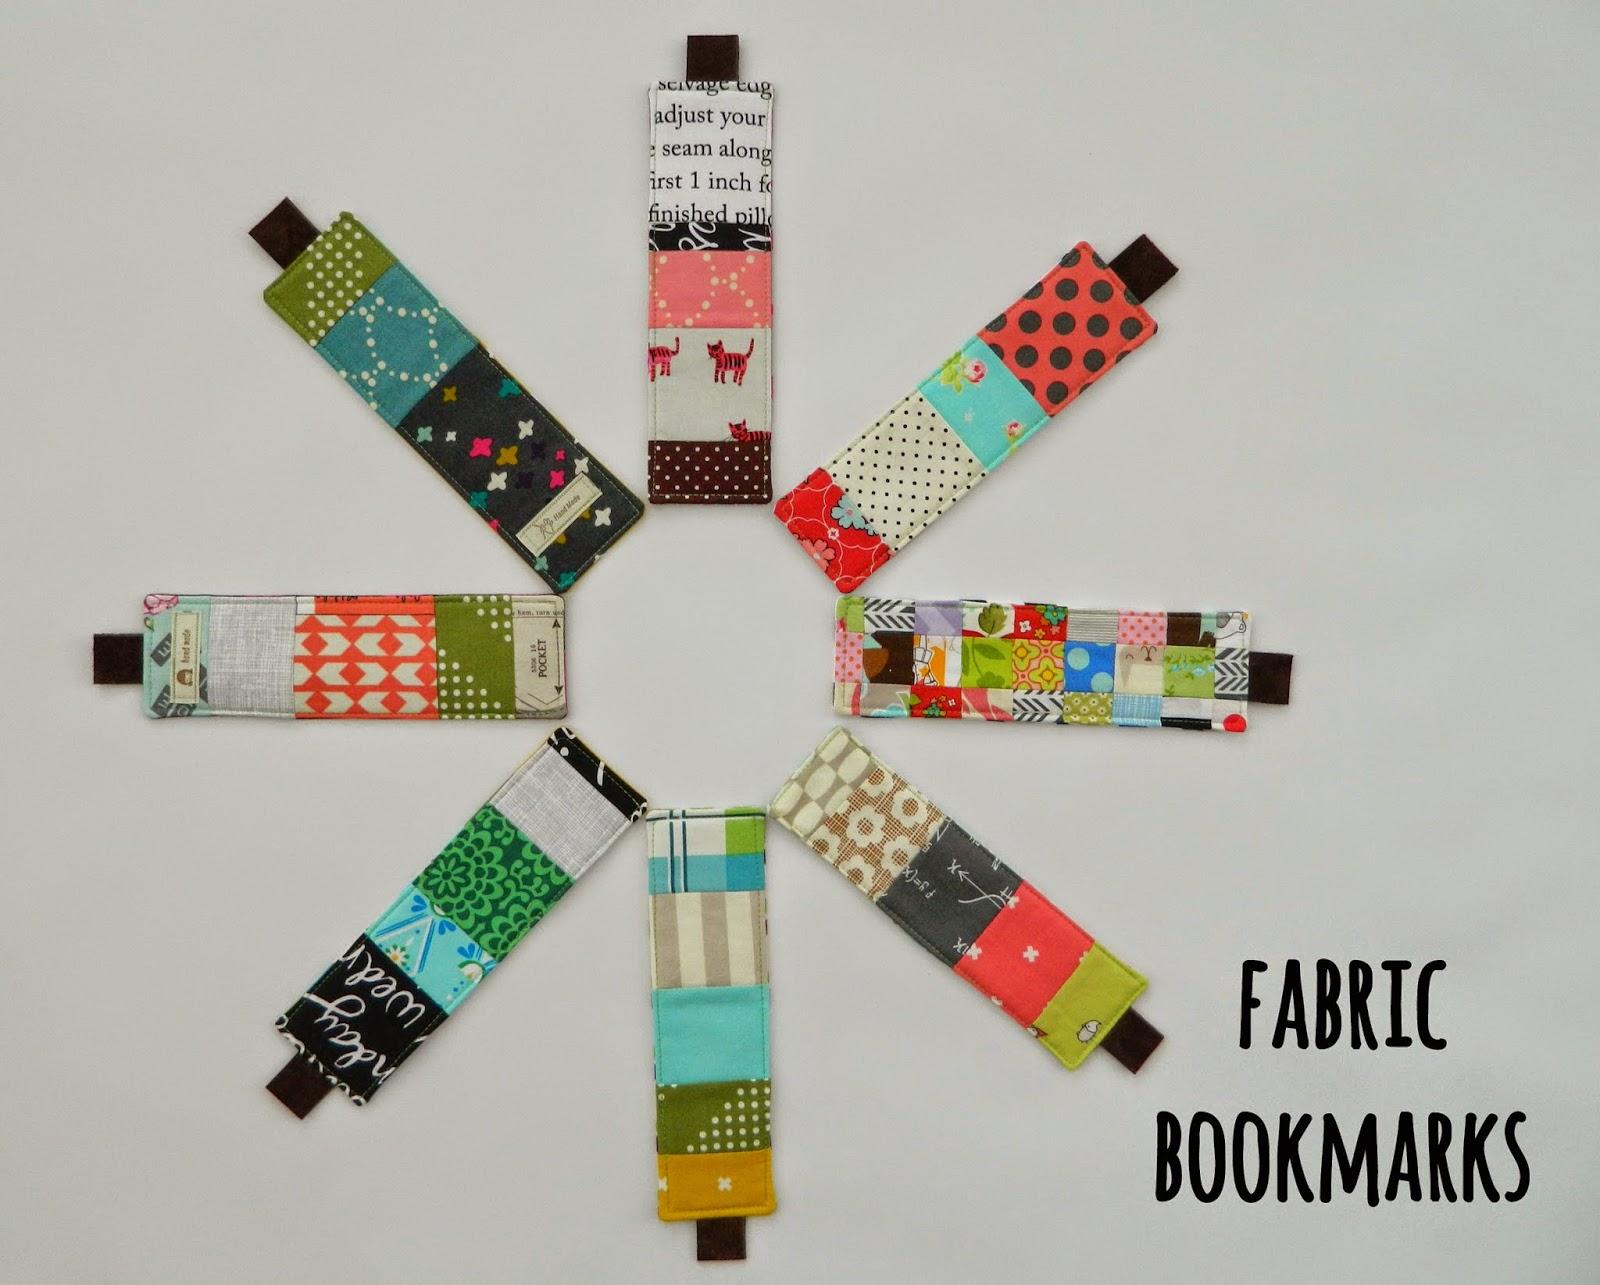 Handmade fabric bookmarks from S.O.T.A.K Handmade